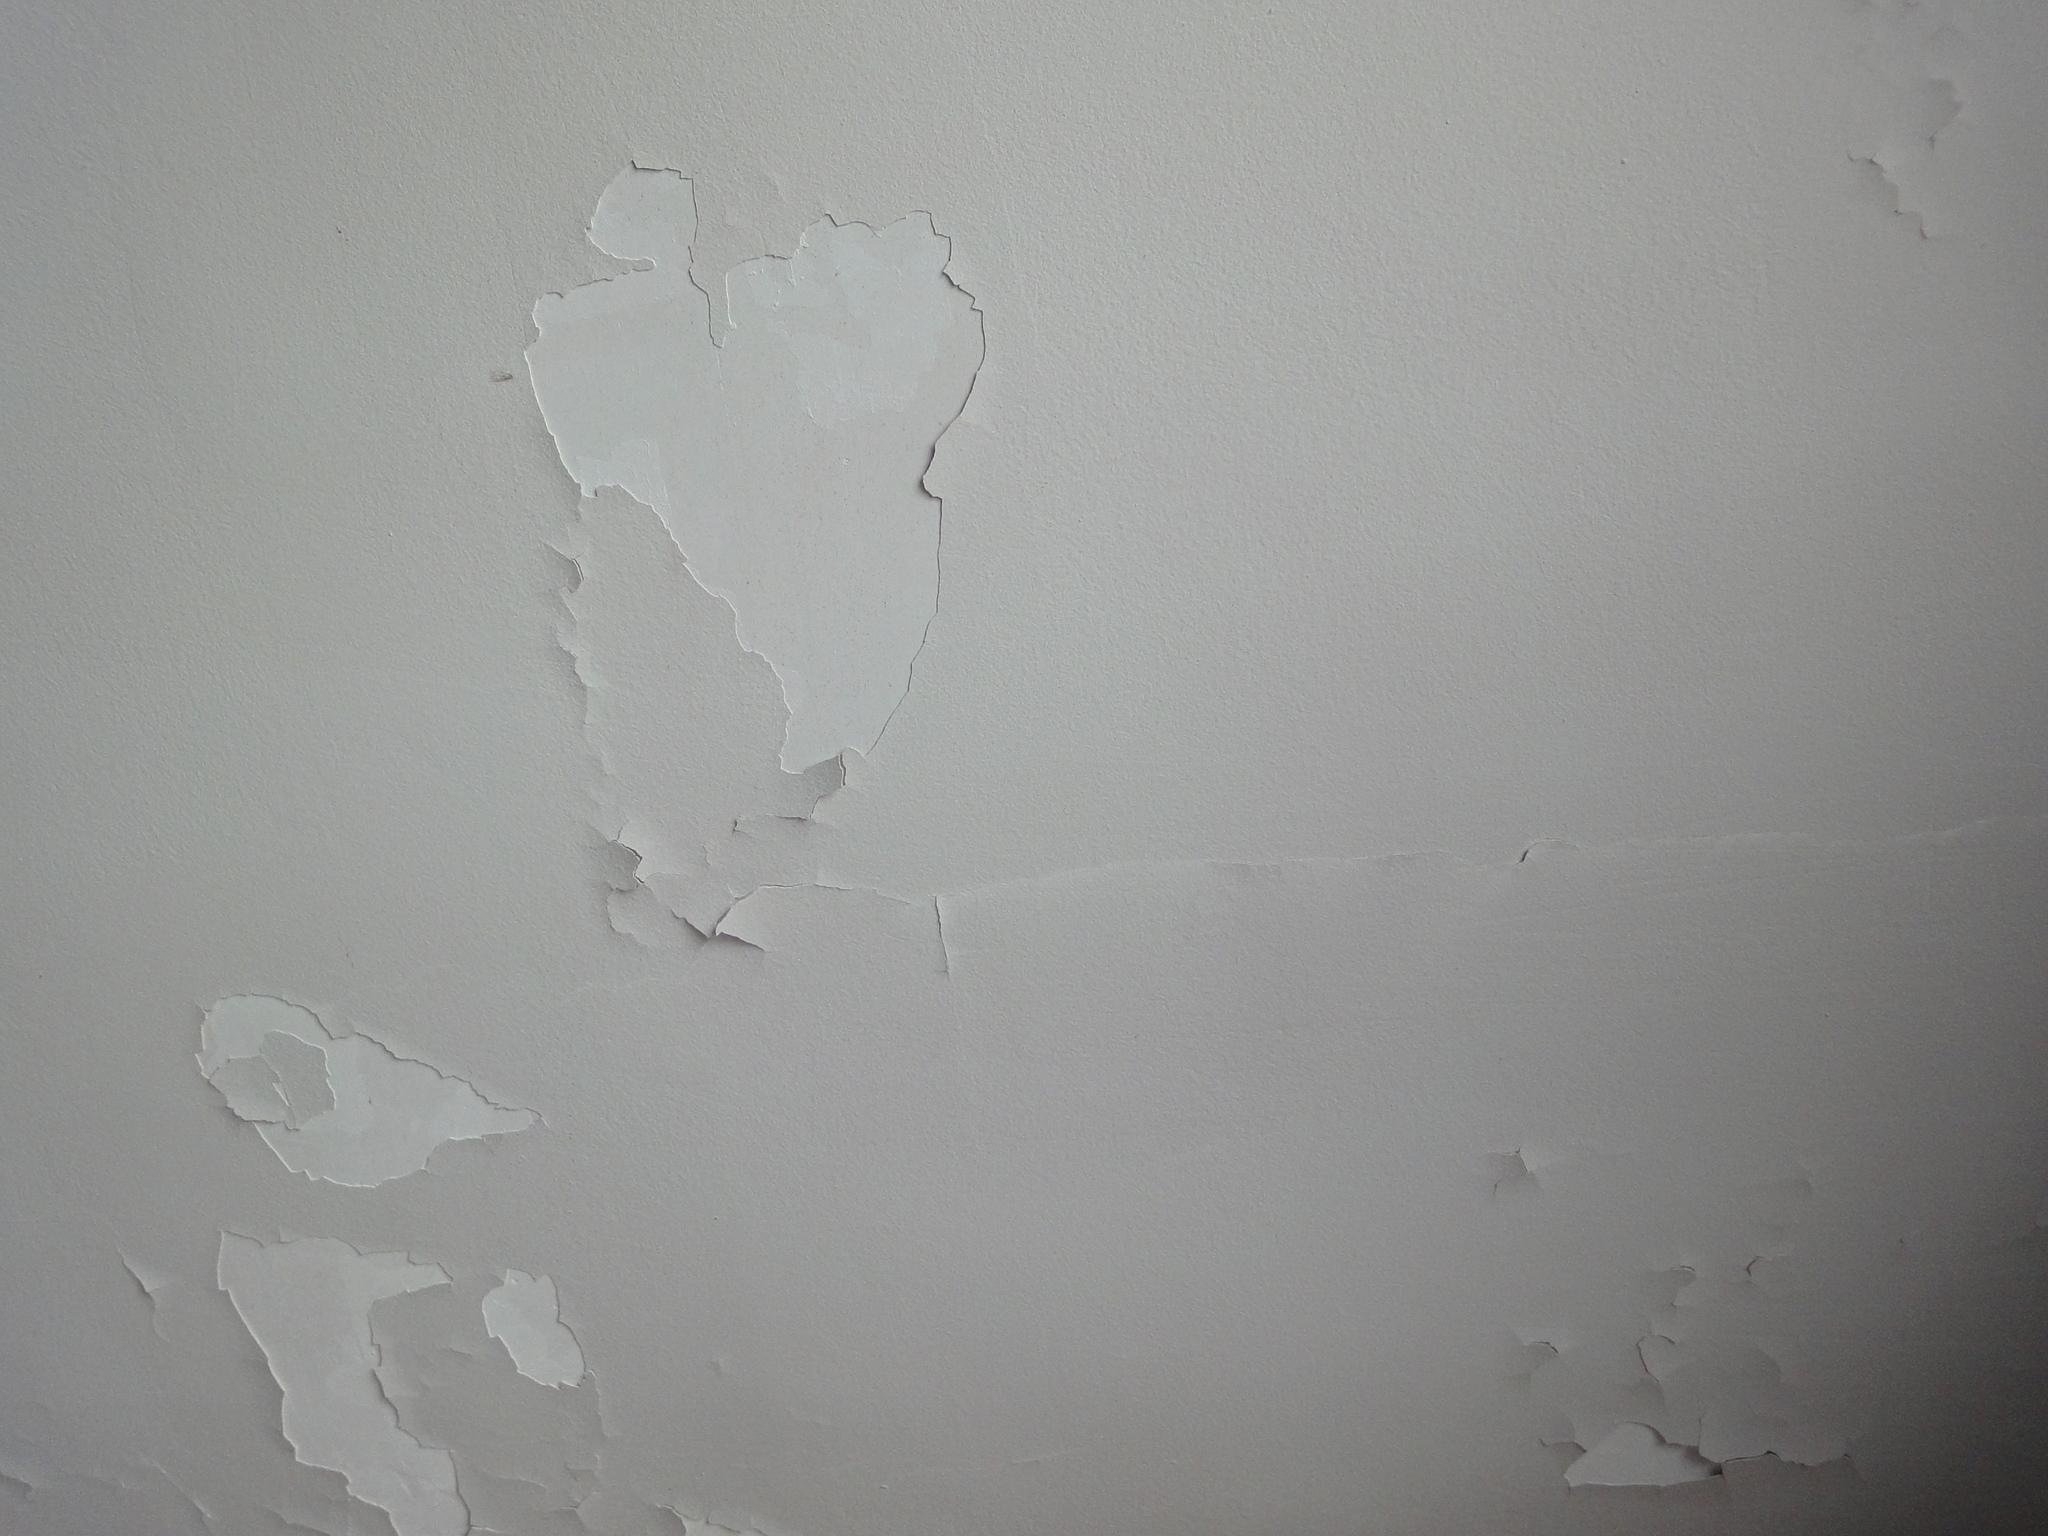 peinture du plafond qui se d colle et tombe. Black Bedroom Furniture Sets. Home Design Ideas